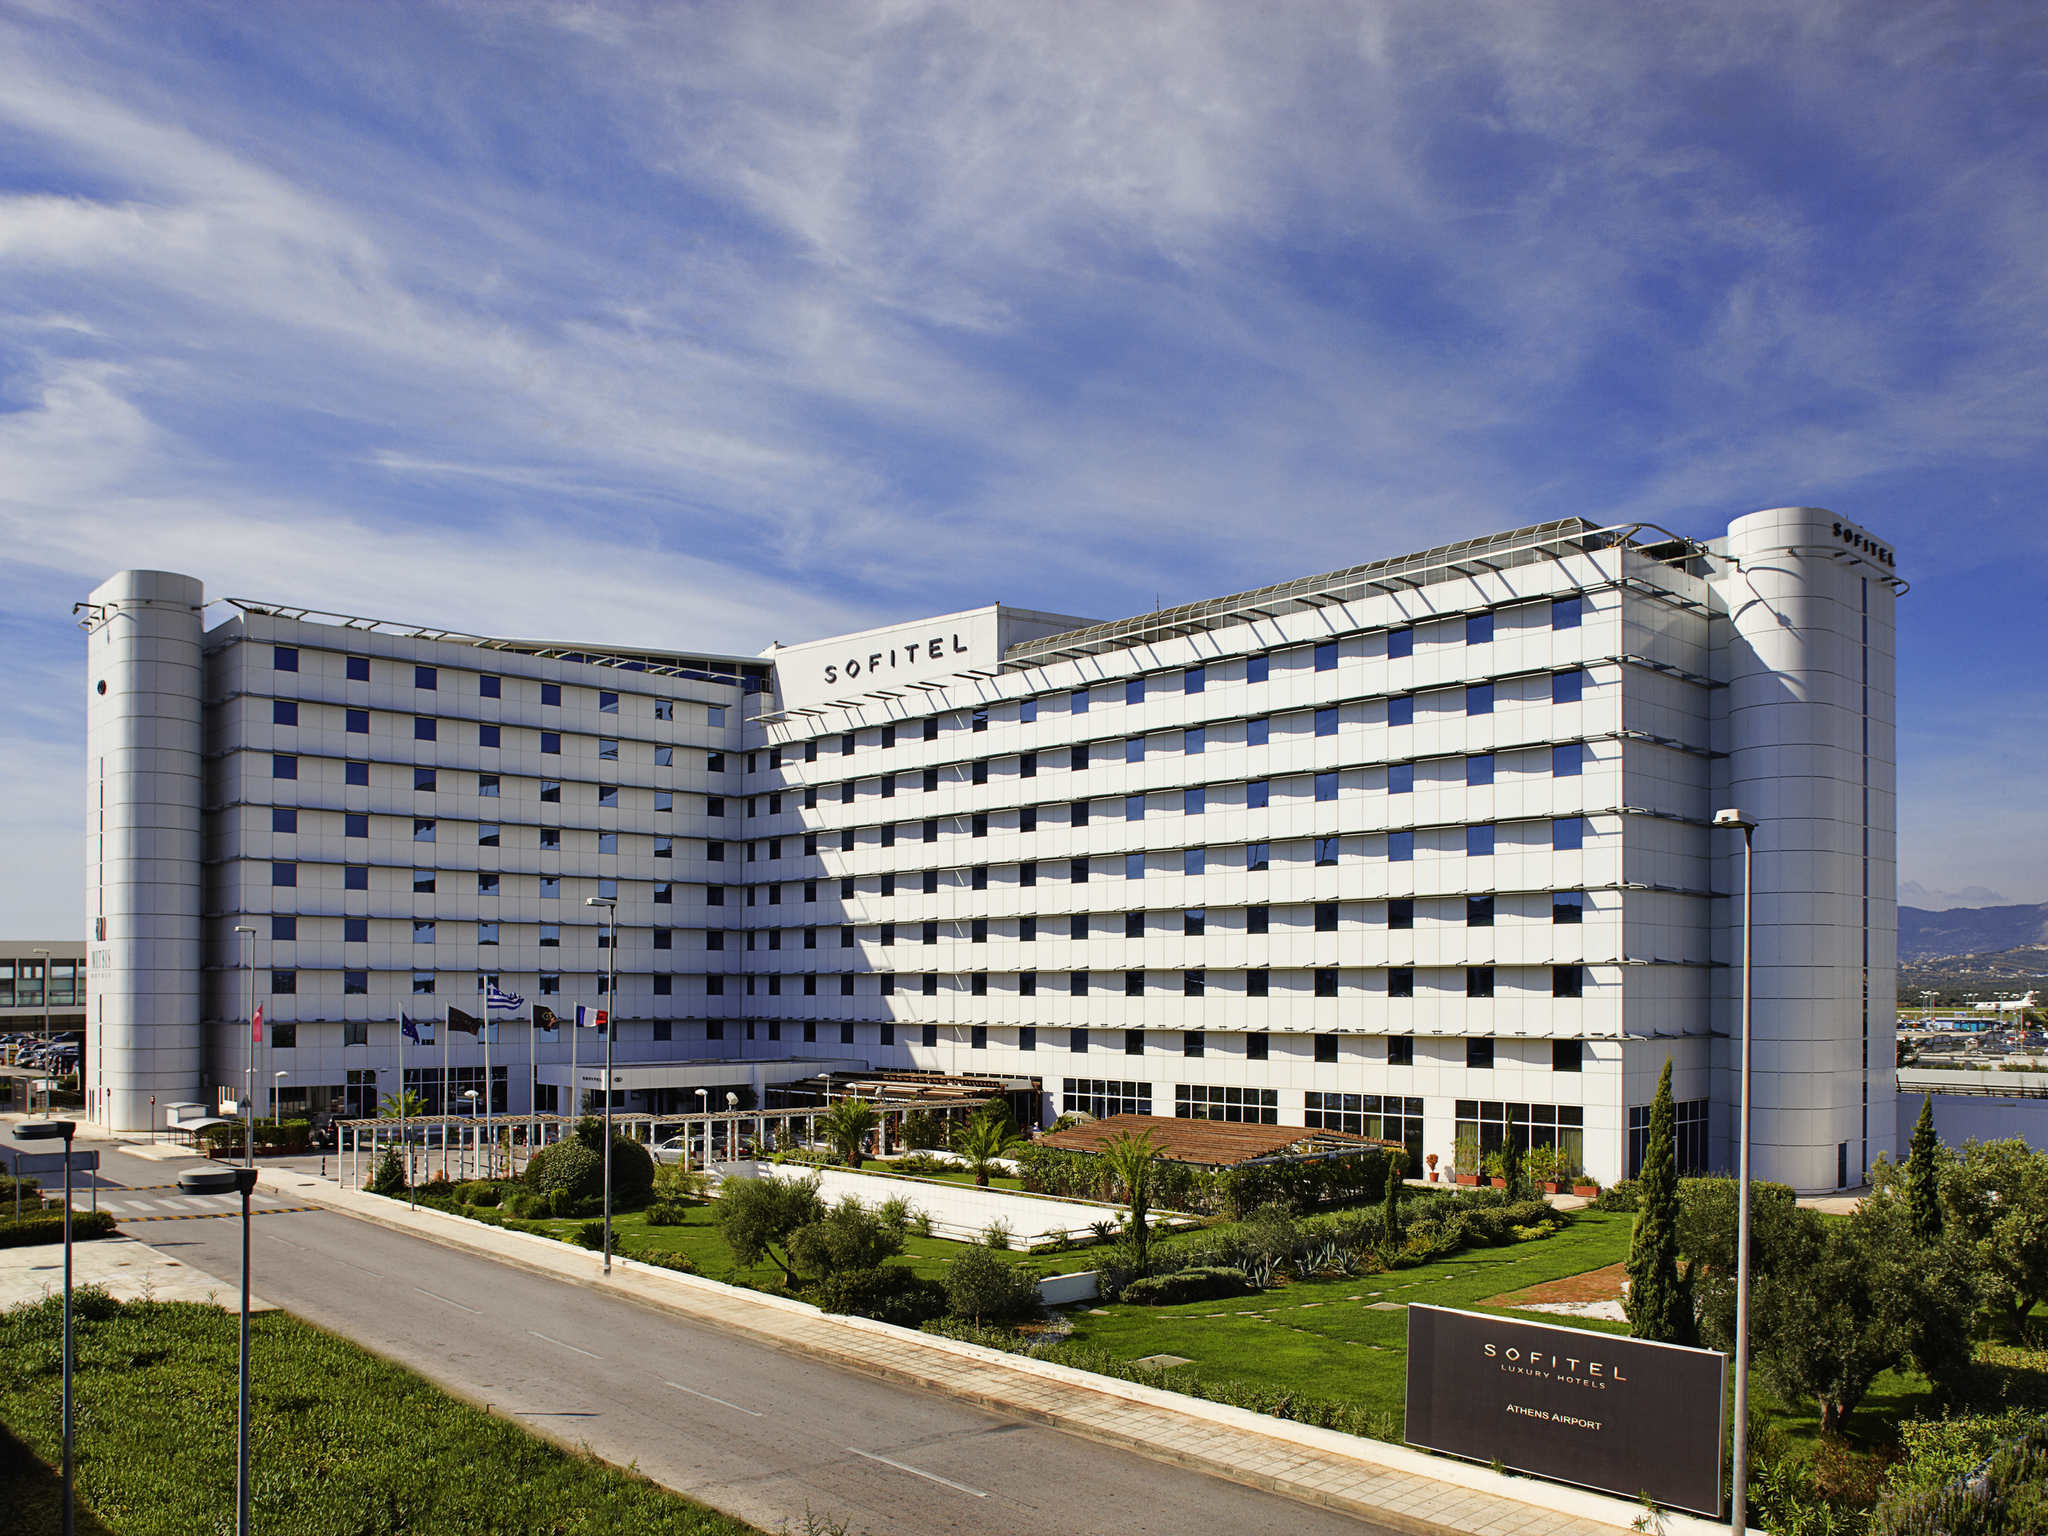 Hotell – Sofitel Athens Airport